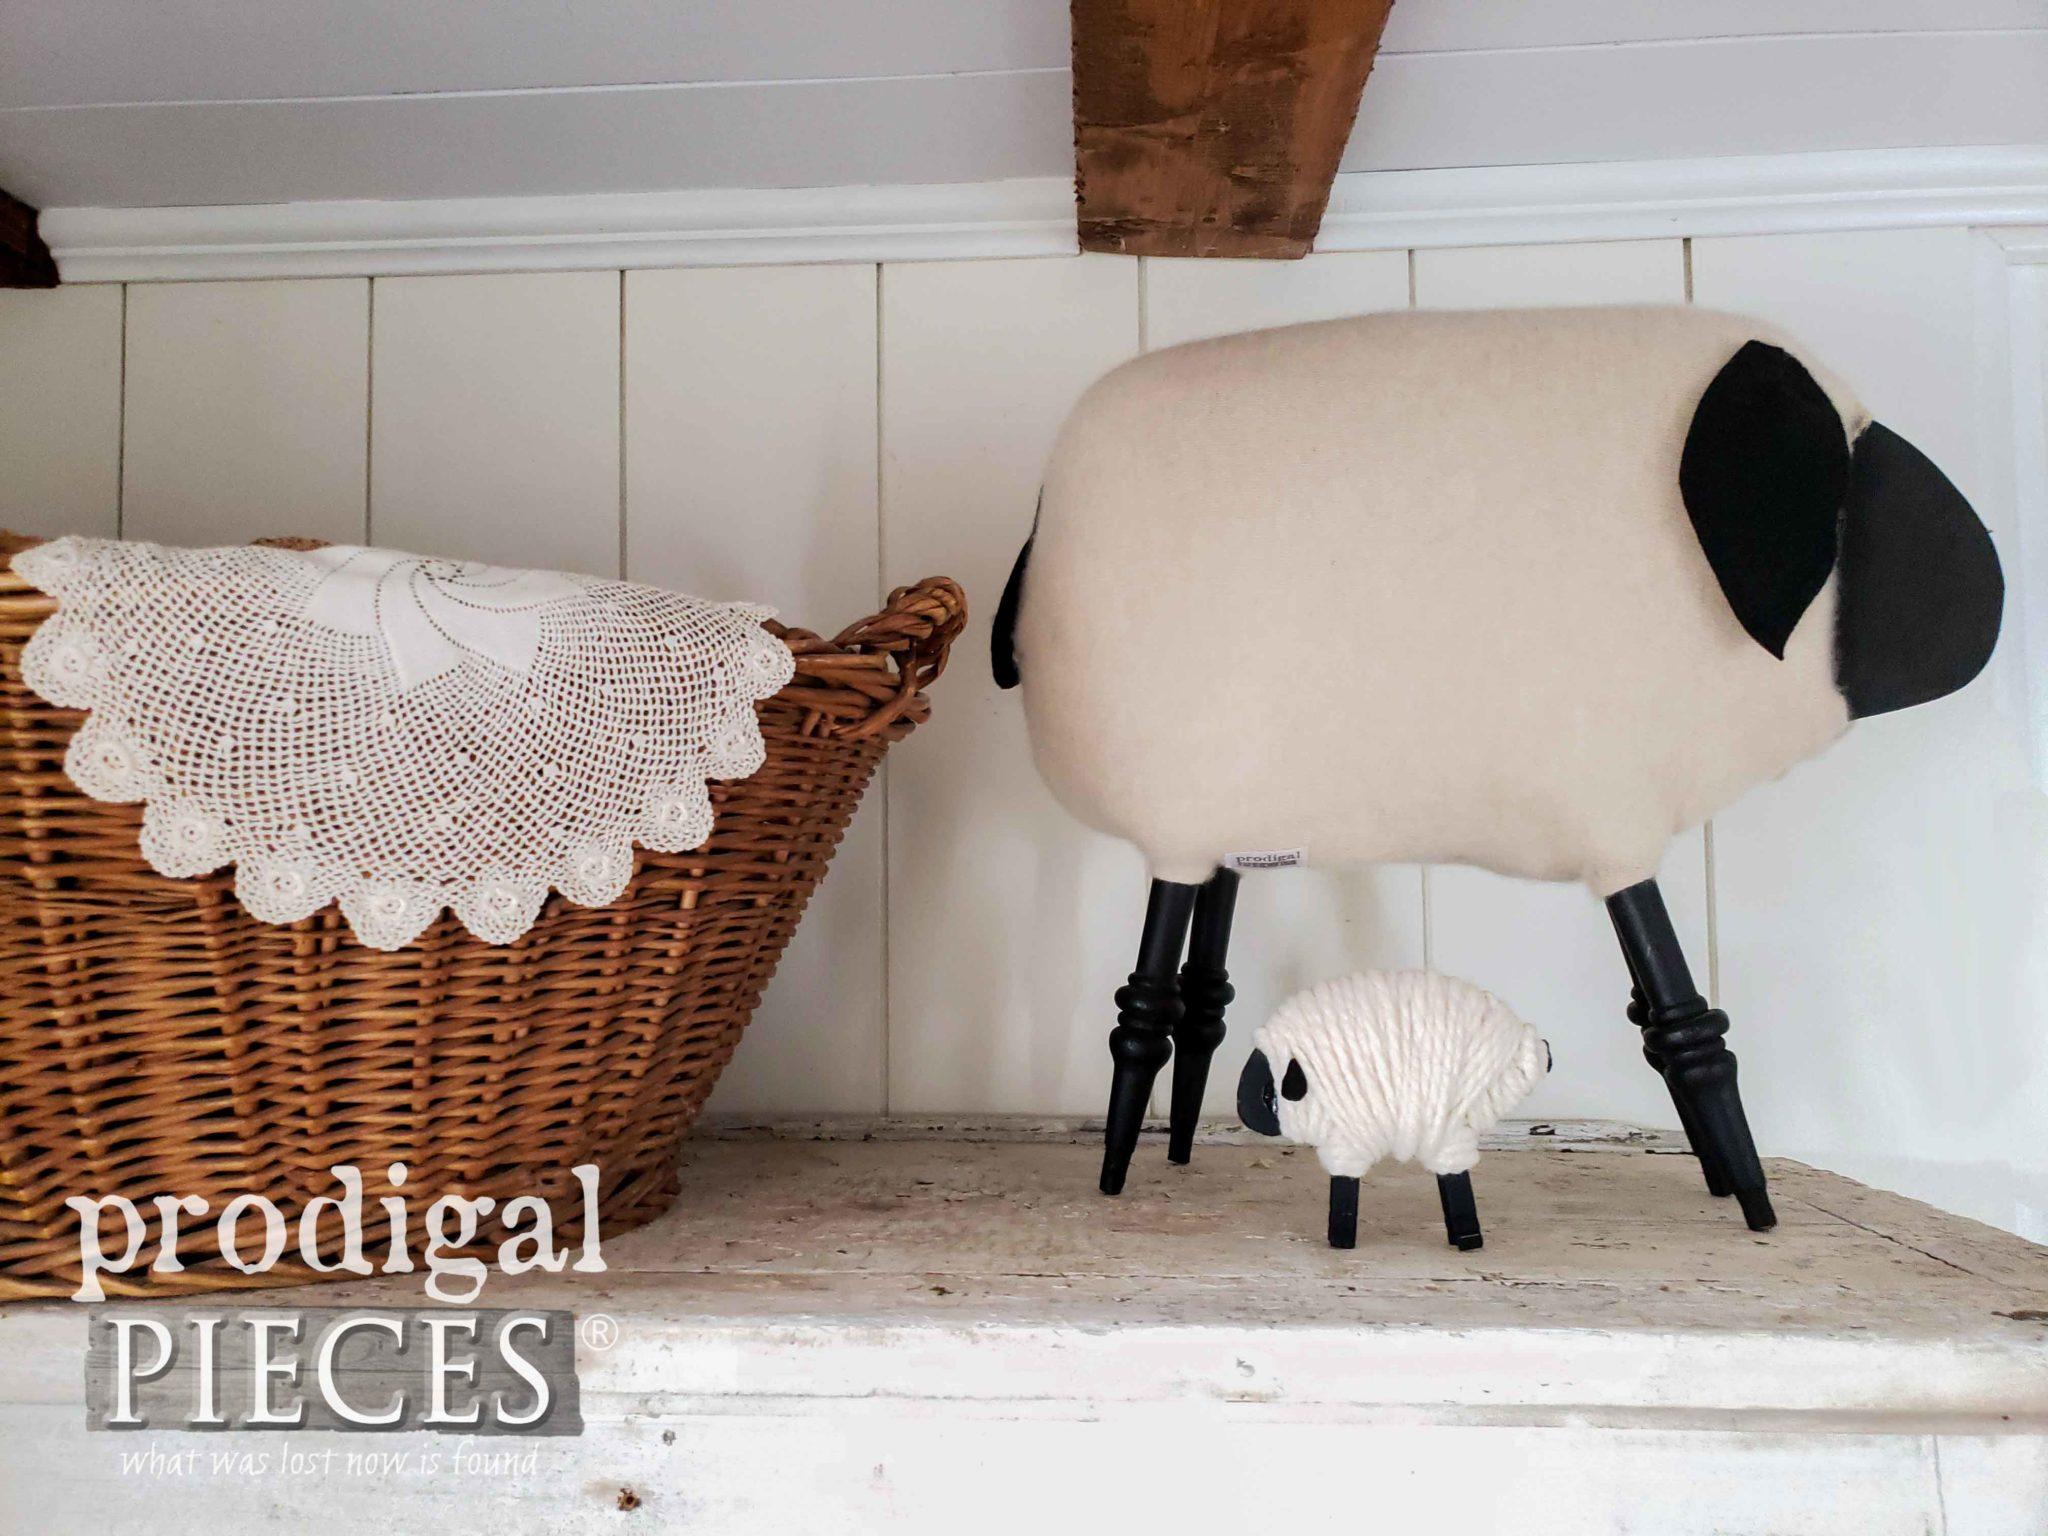 Adorable Farmhouse Sheep Made from Repurposed Materials | DIY tutorials by Larissa of Prodigal Pieces | prodigalpieces.com